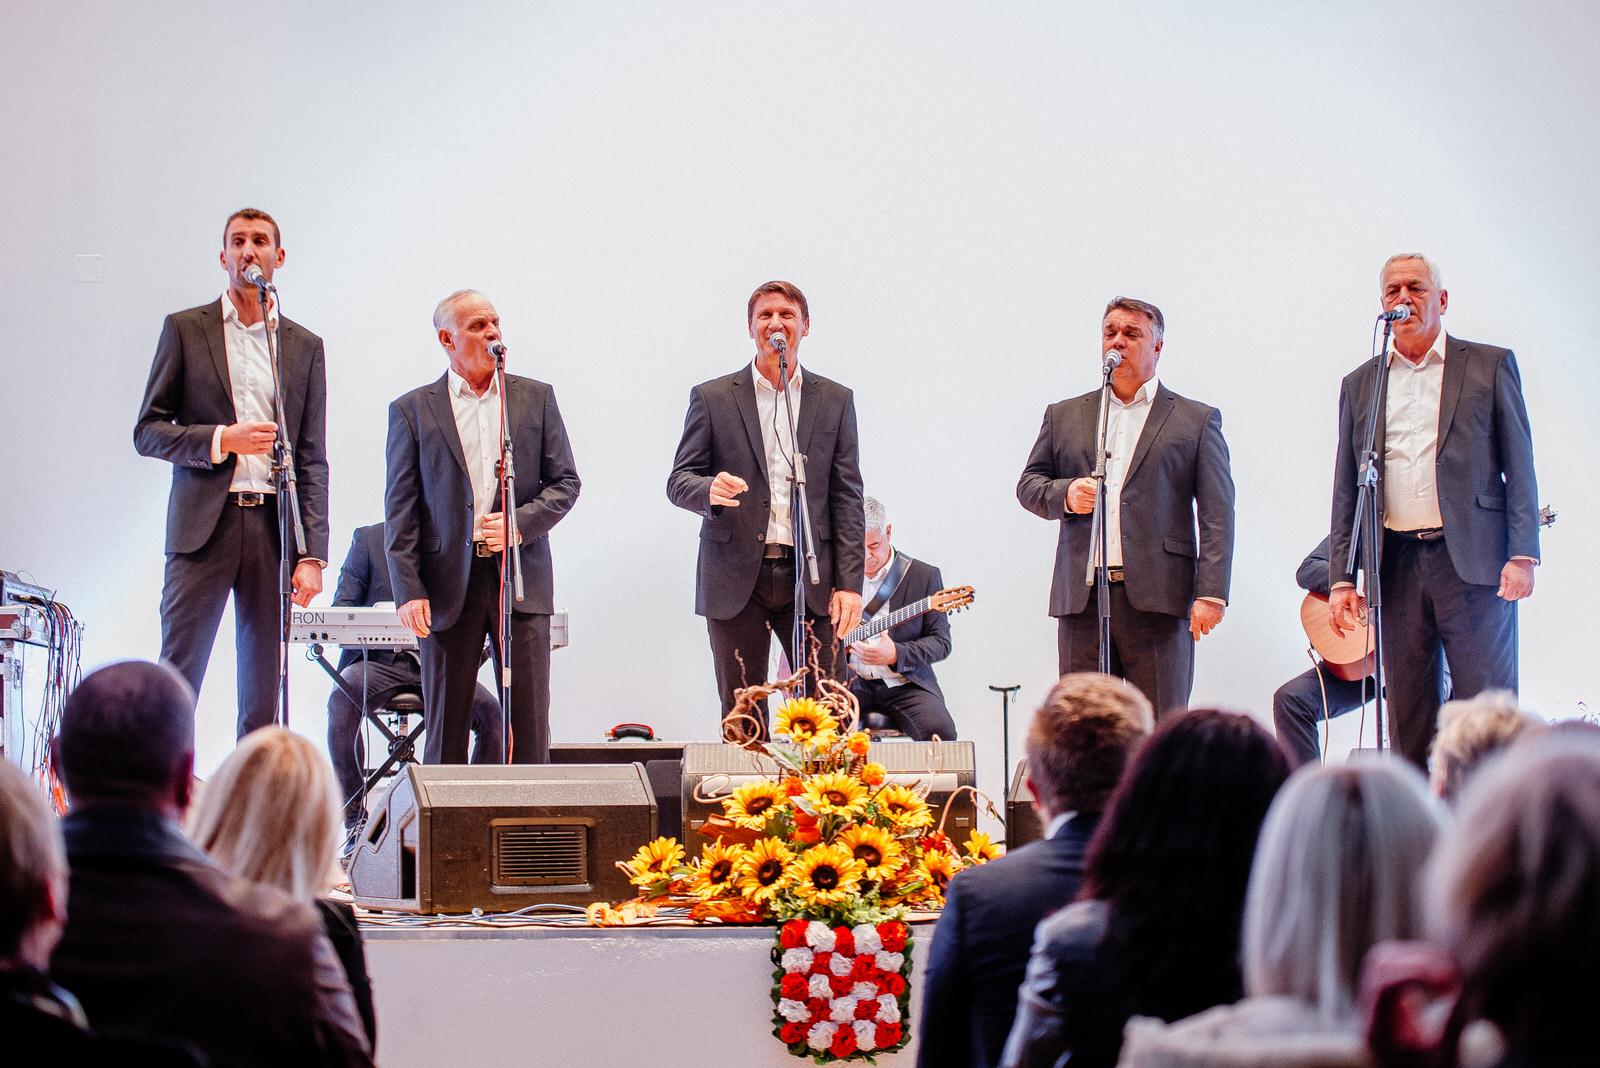 likaclub_korenica_klapa-intrade_dan-neovisnosti_2019-14